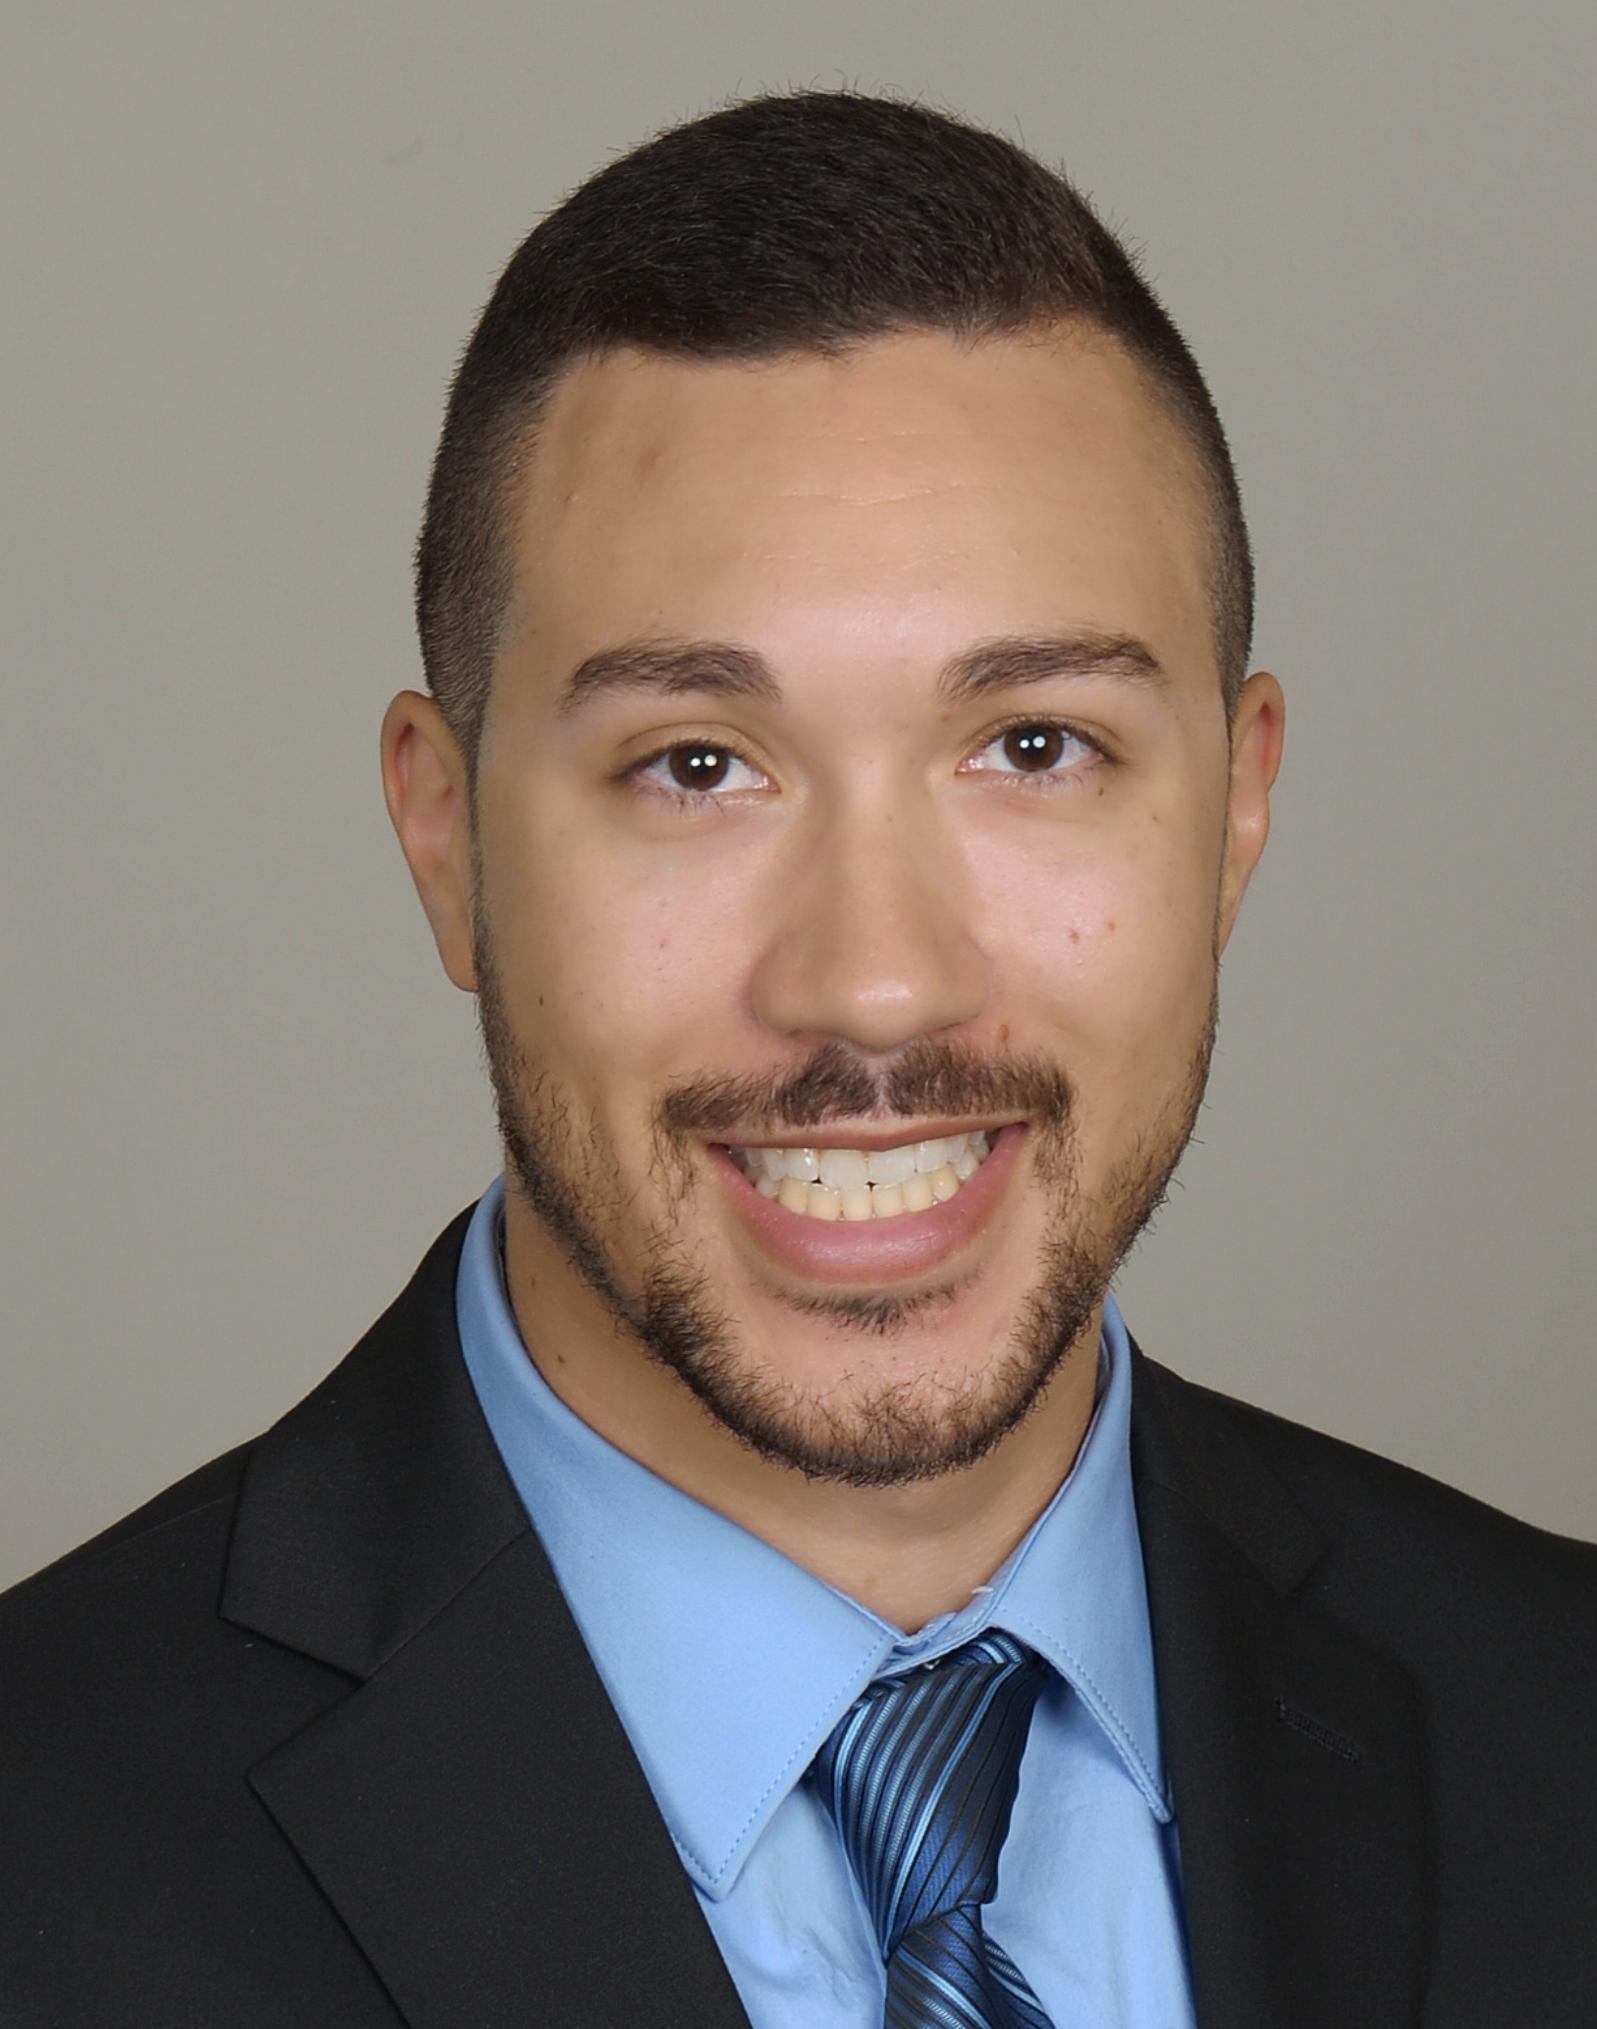 NATHAN WILLIAMSON  Your Registered Representative & Insurance Agent